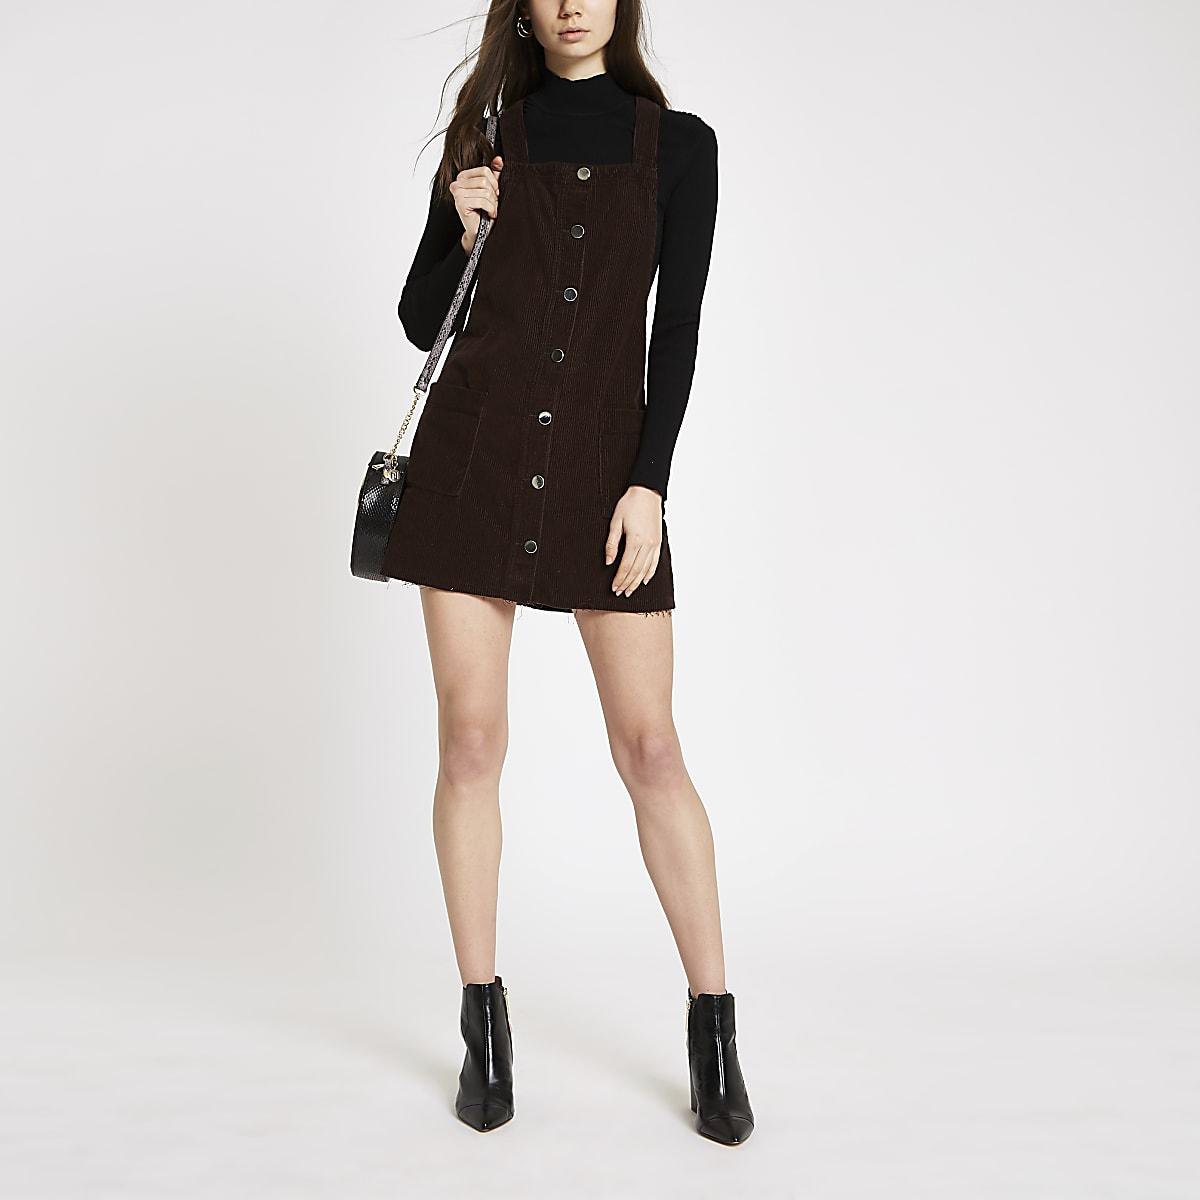 Brown overall denim dress